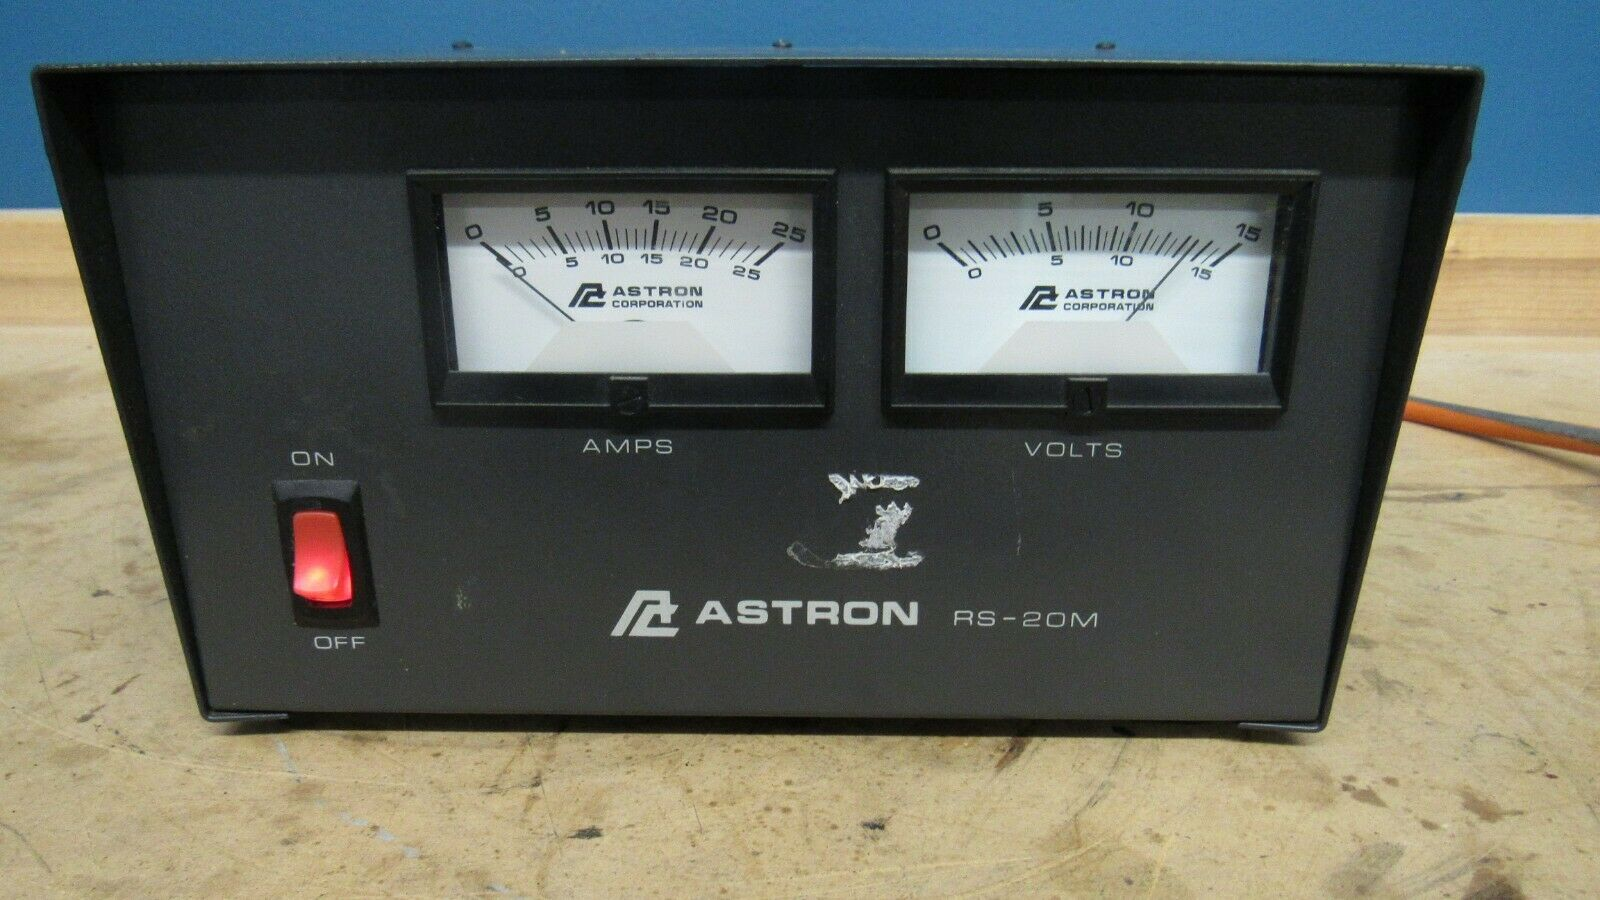 lapeergoldandloan8664 ASTRON RS-20M POWER SUPPLY Volt and Amp Meter